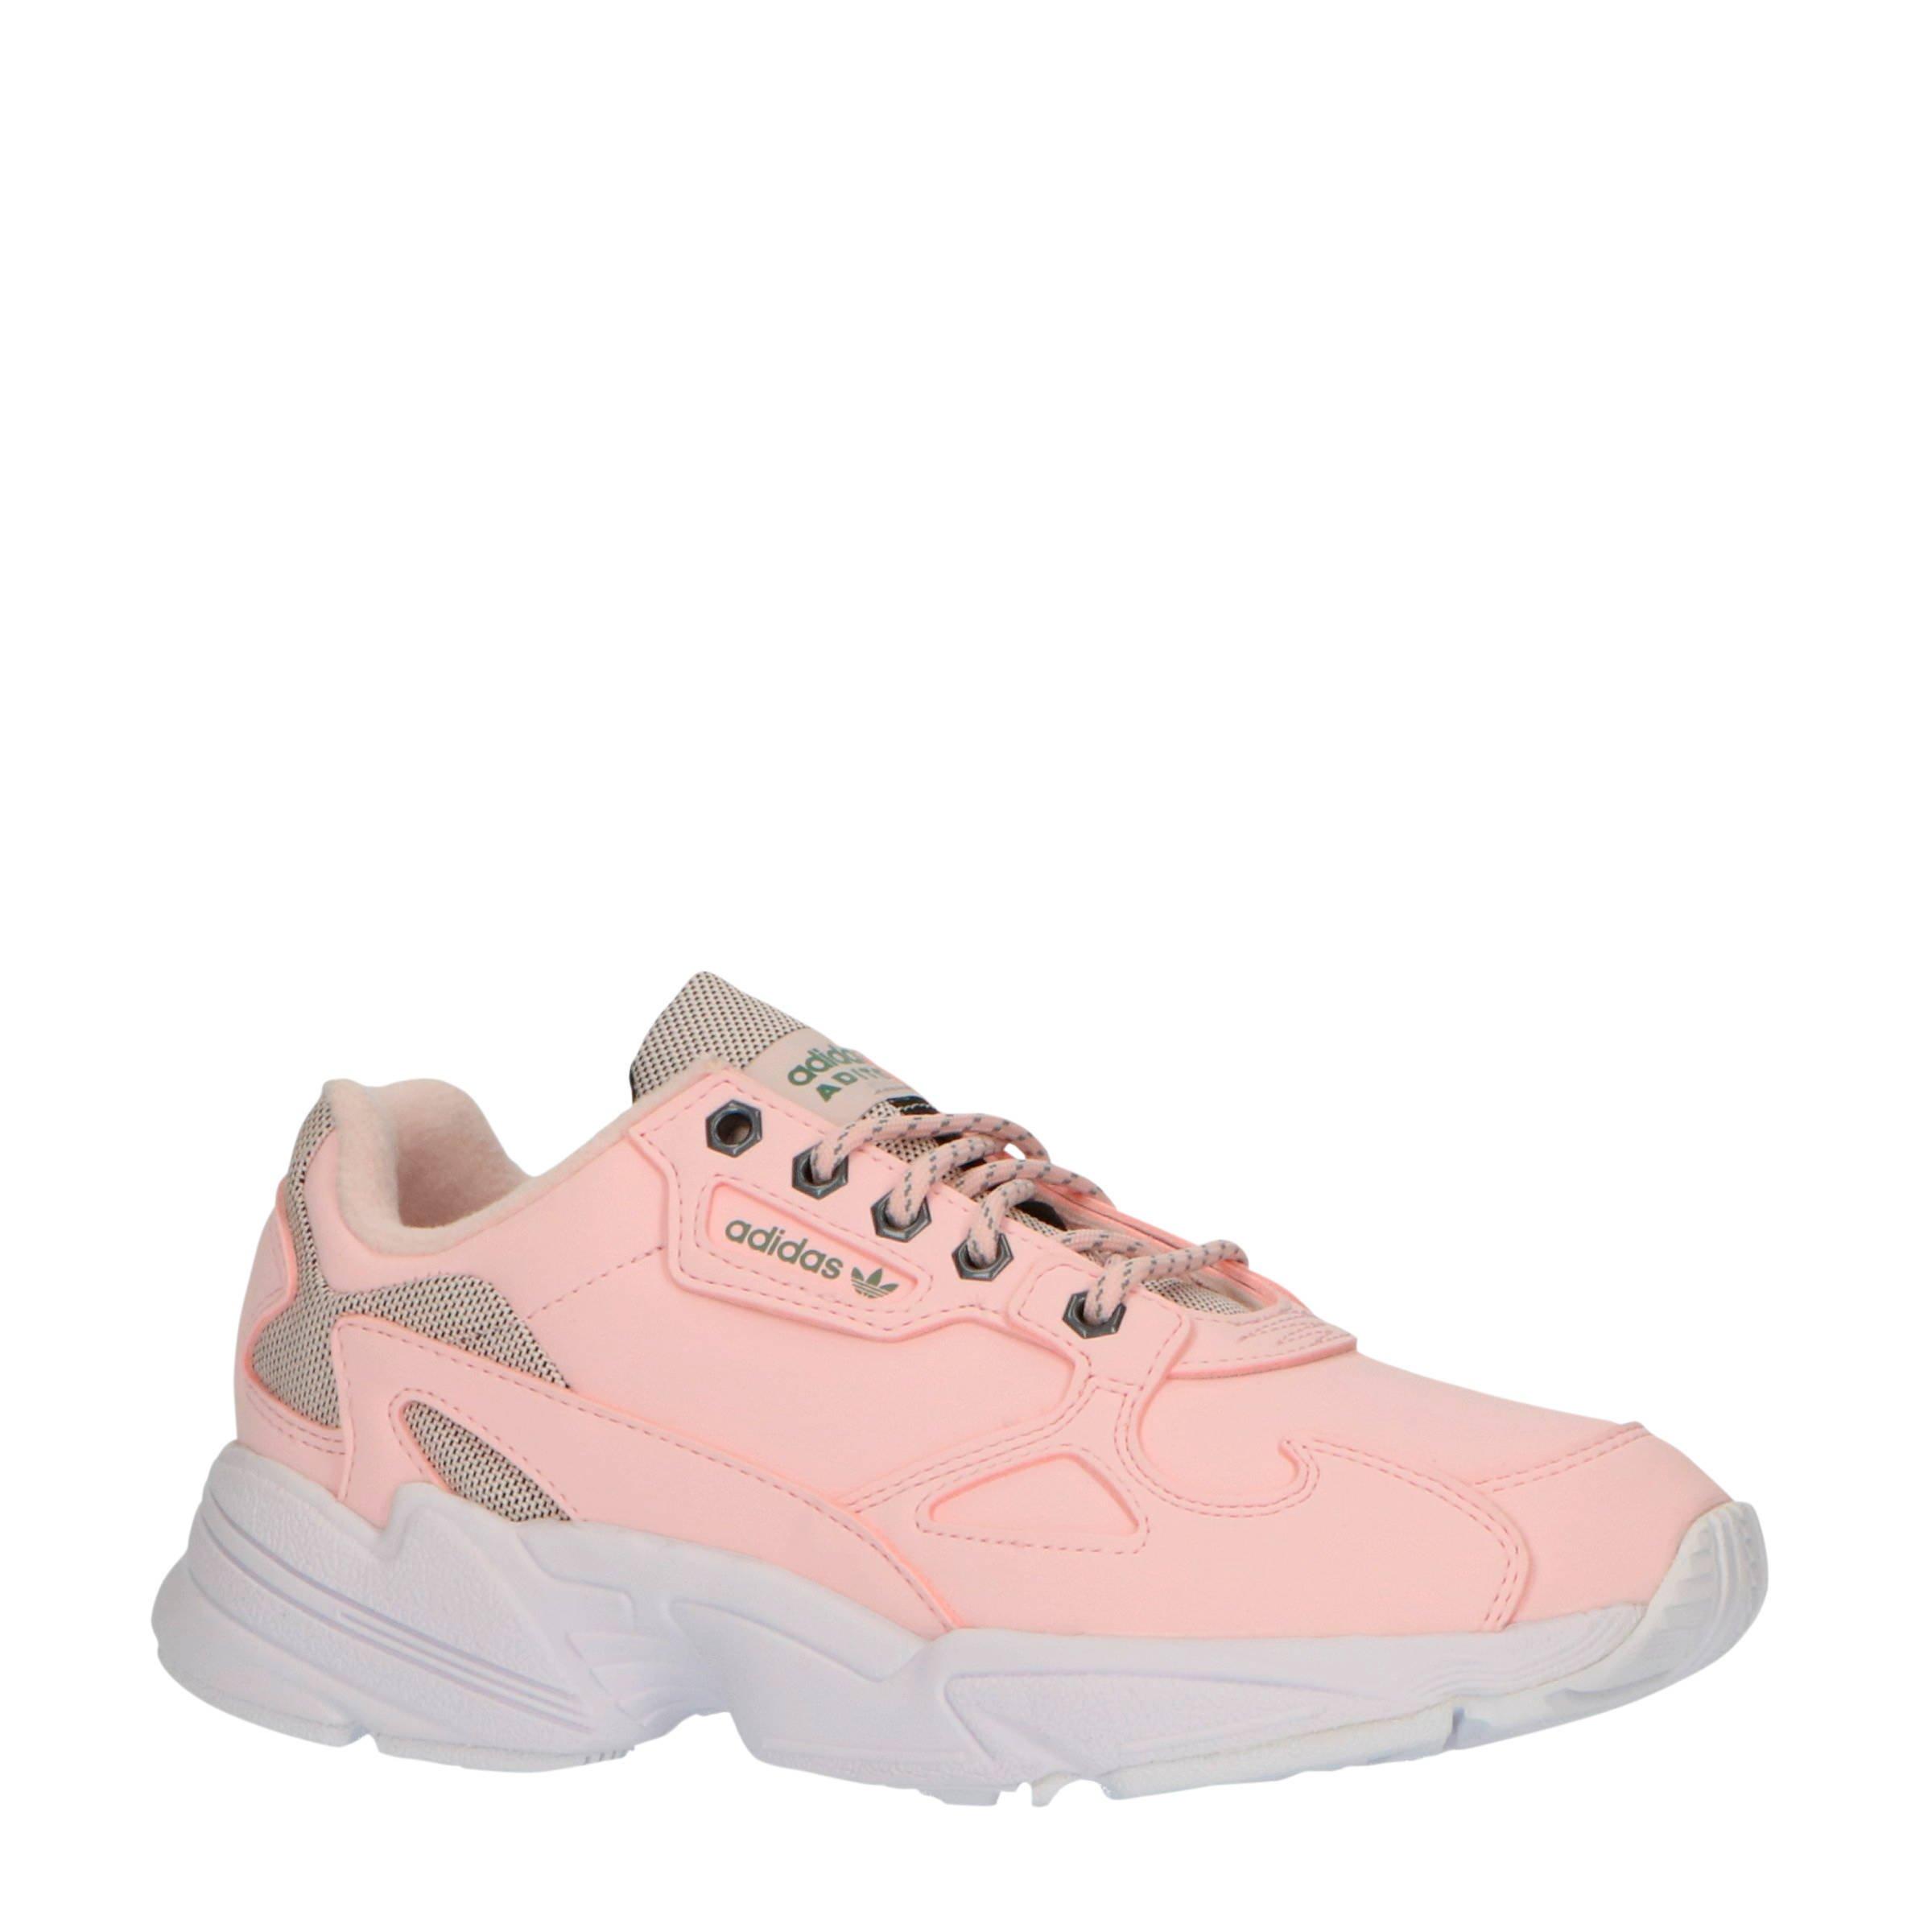 adidas Originals Falcon W sneakers roze | wehkamp